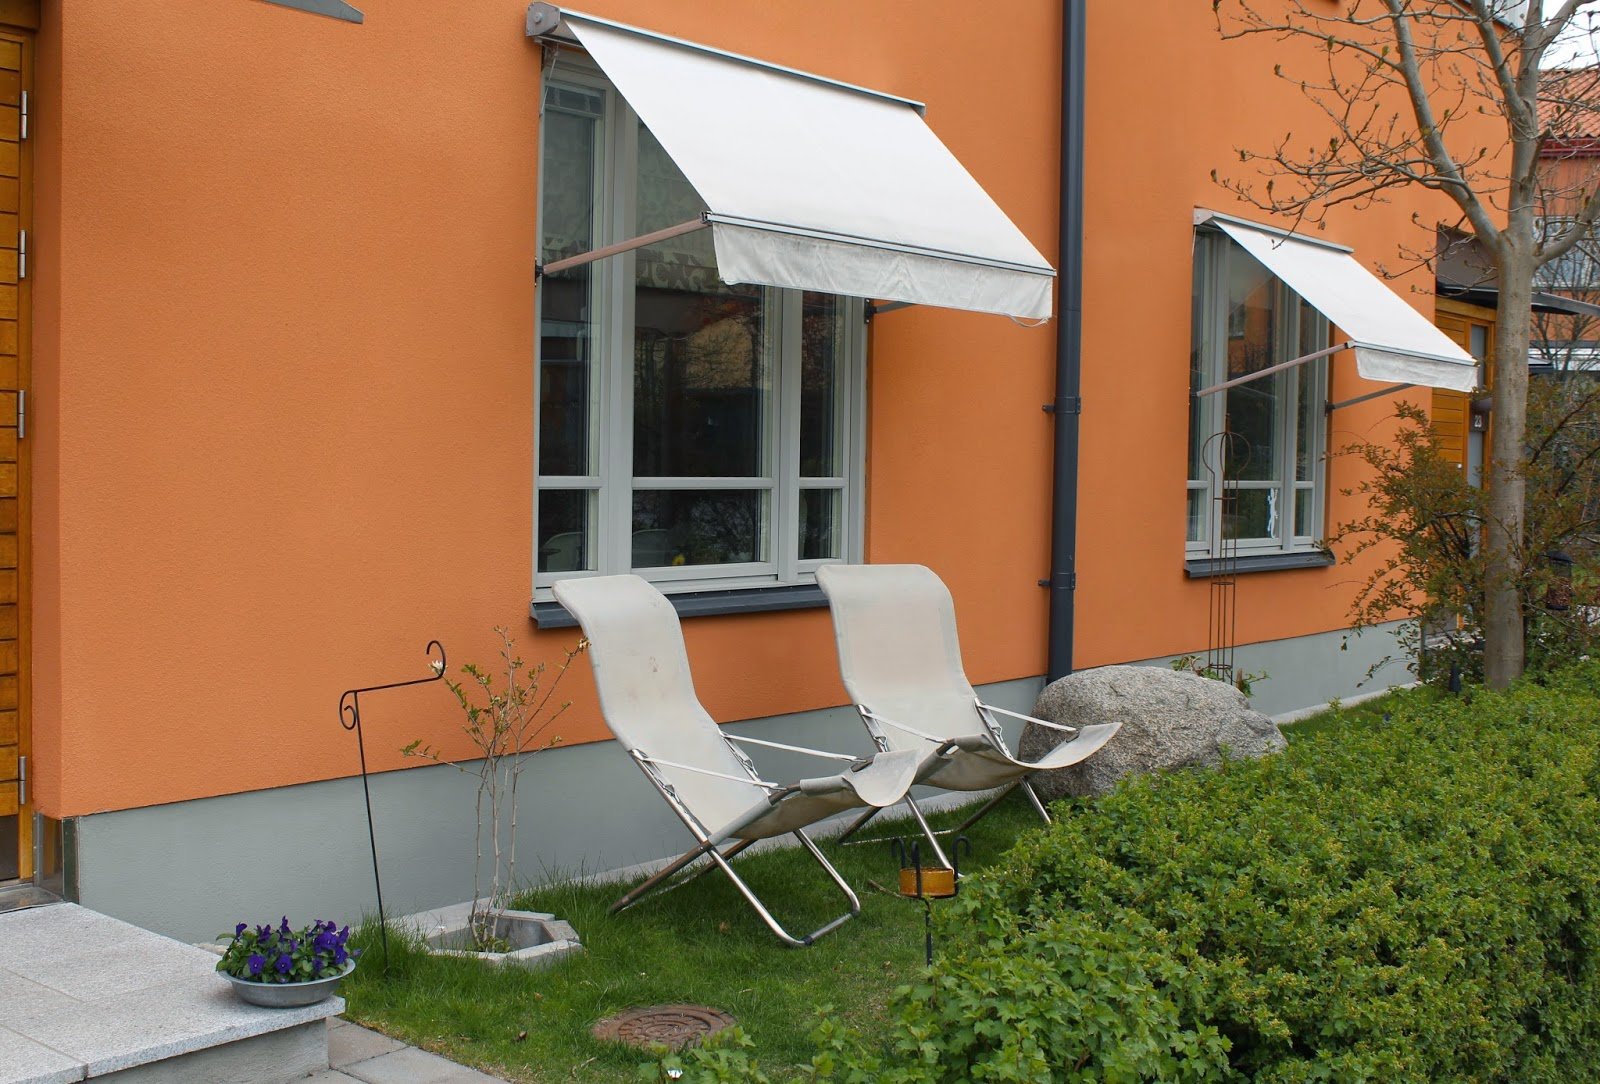 Lotta InsideOut: Trädgårdsdesign - liten tomt i norrläge